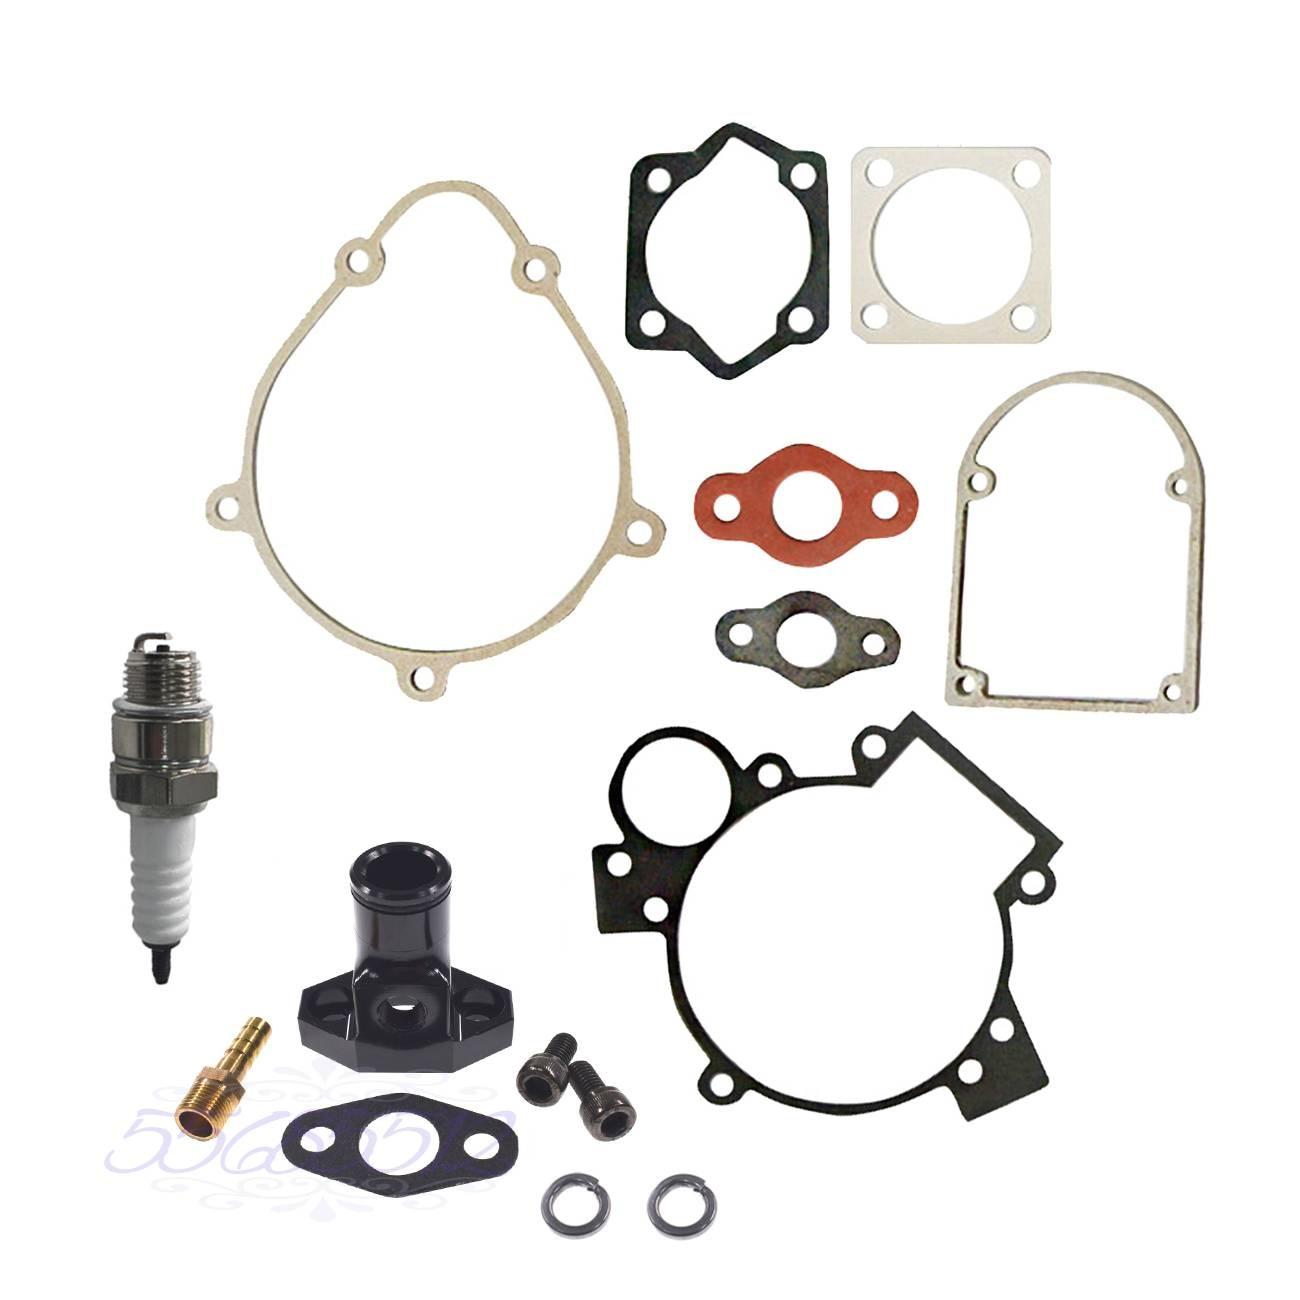 Colector De Admissão & Junta Kit CNC Preto & Spark plug Para 80cc Bicicleta Motorizada